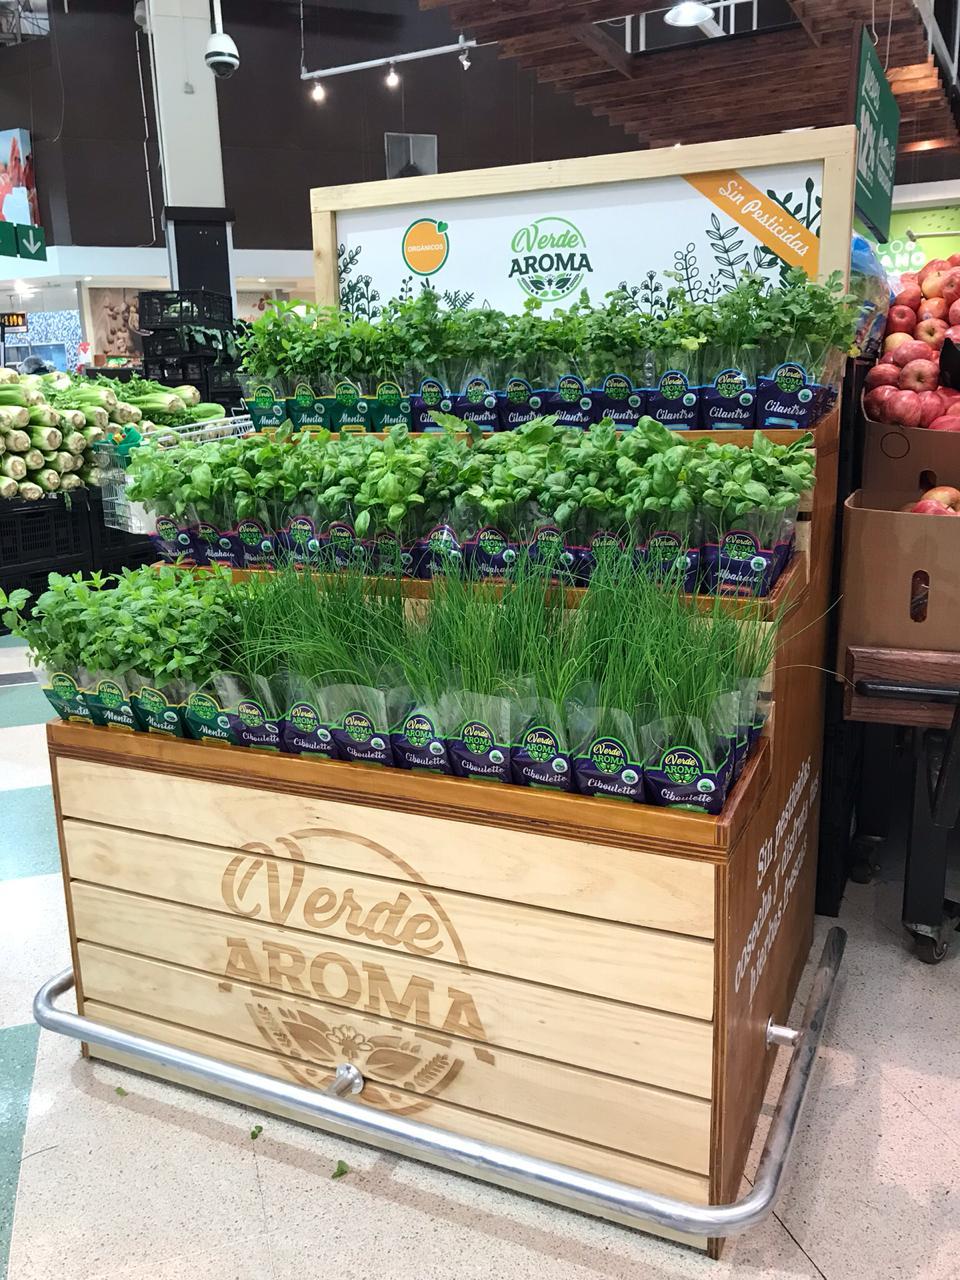 verde aroma gondola